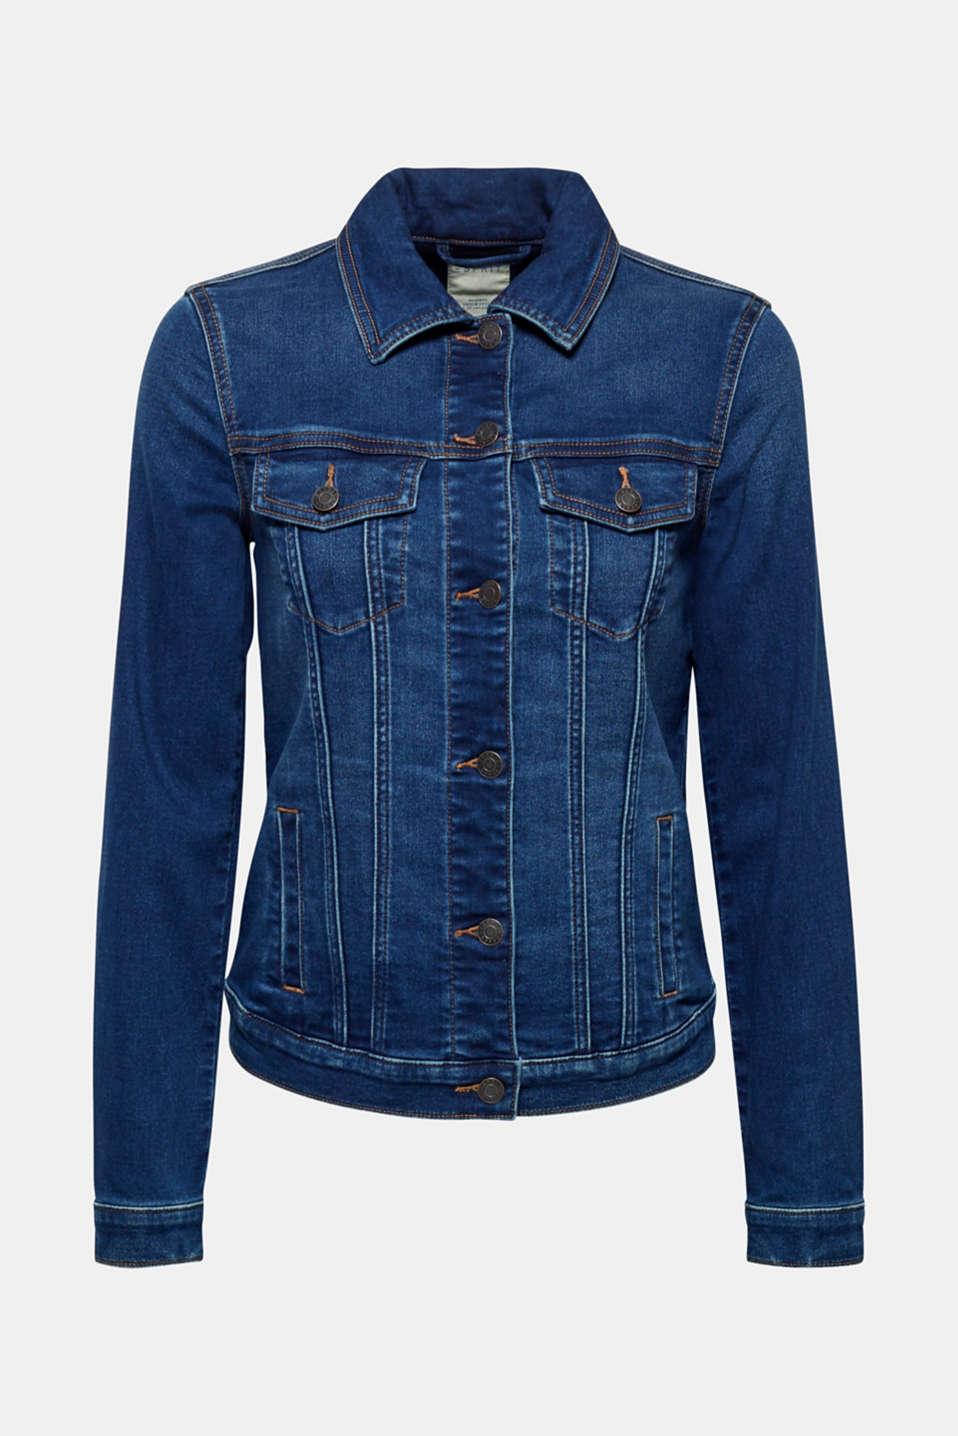 Jackets indoor denim, BLUE DARK WASH, detail image number 9